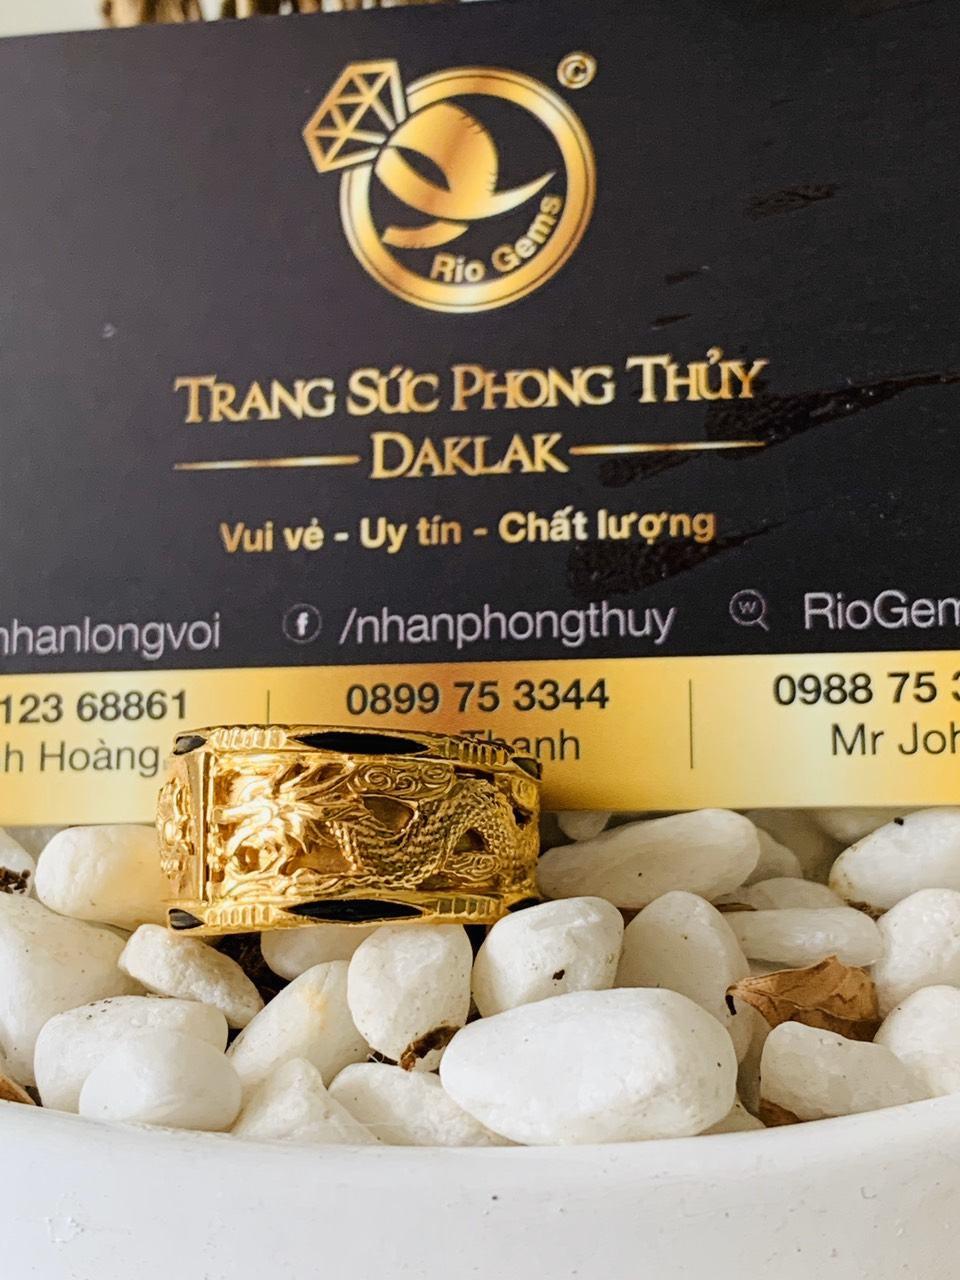 nhan rong phong thuy lua vang (32)